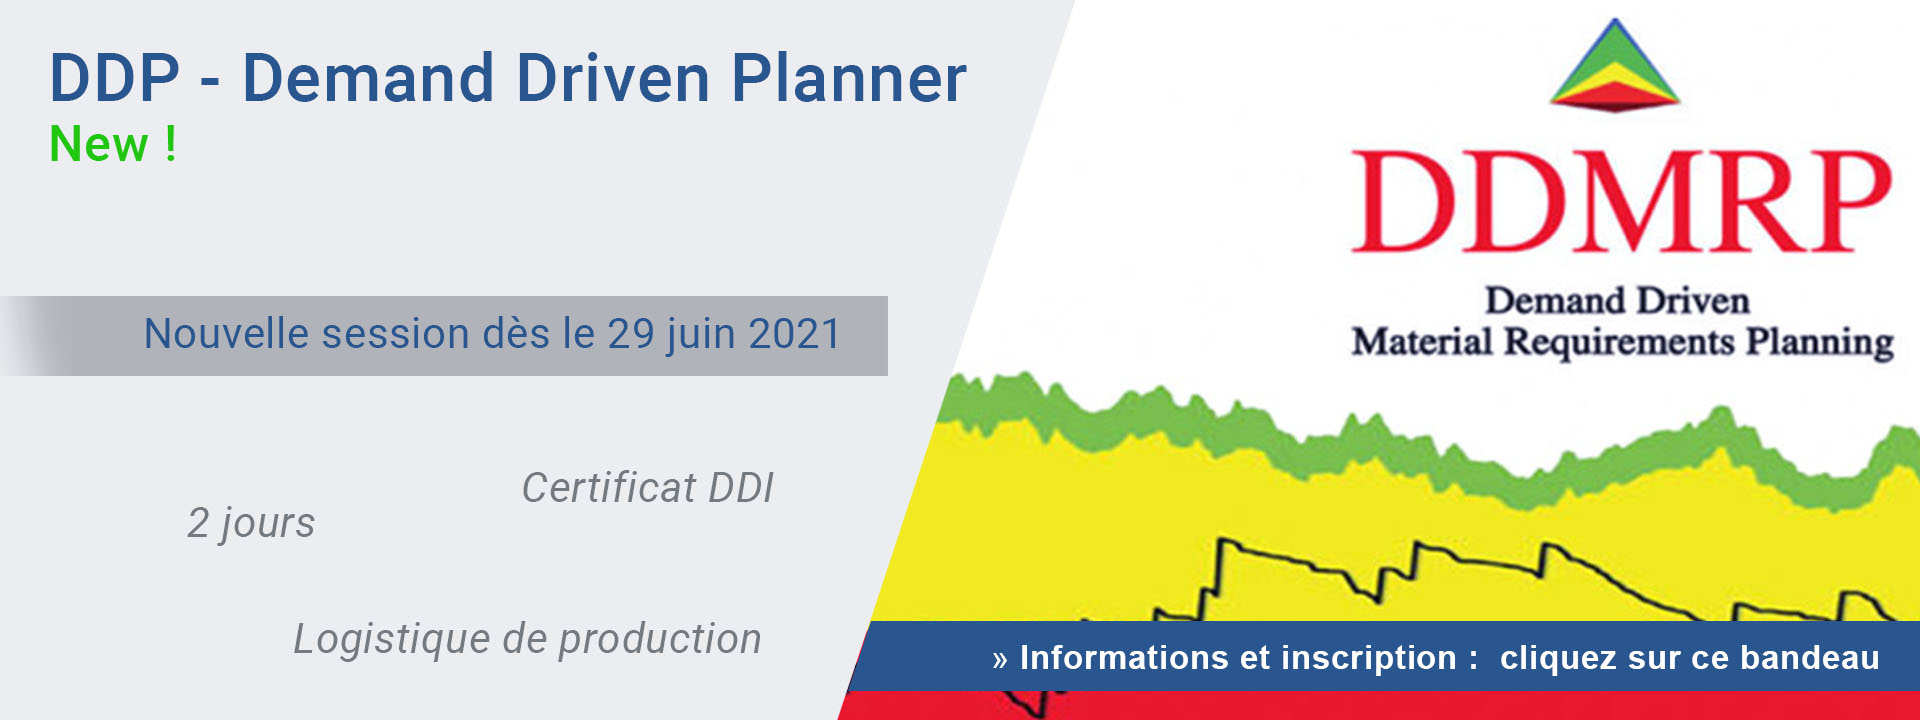 DDP - Demand Driven Planner